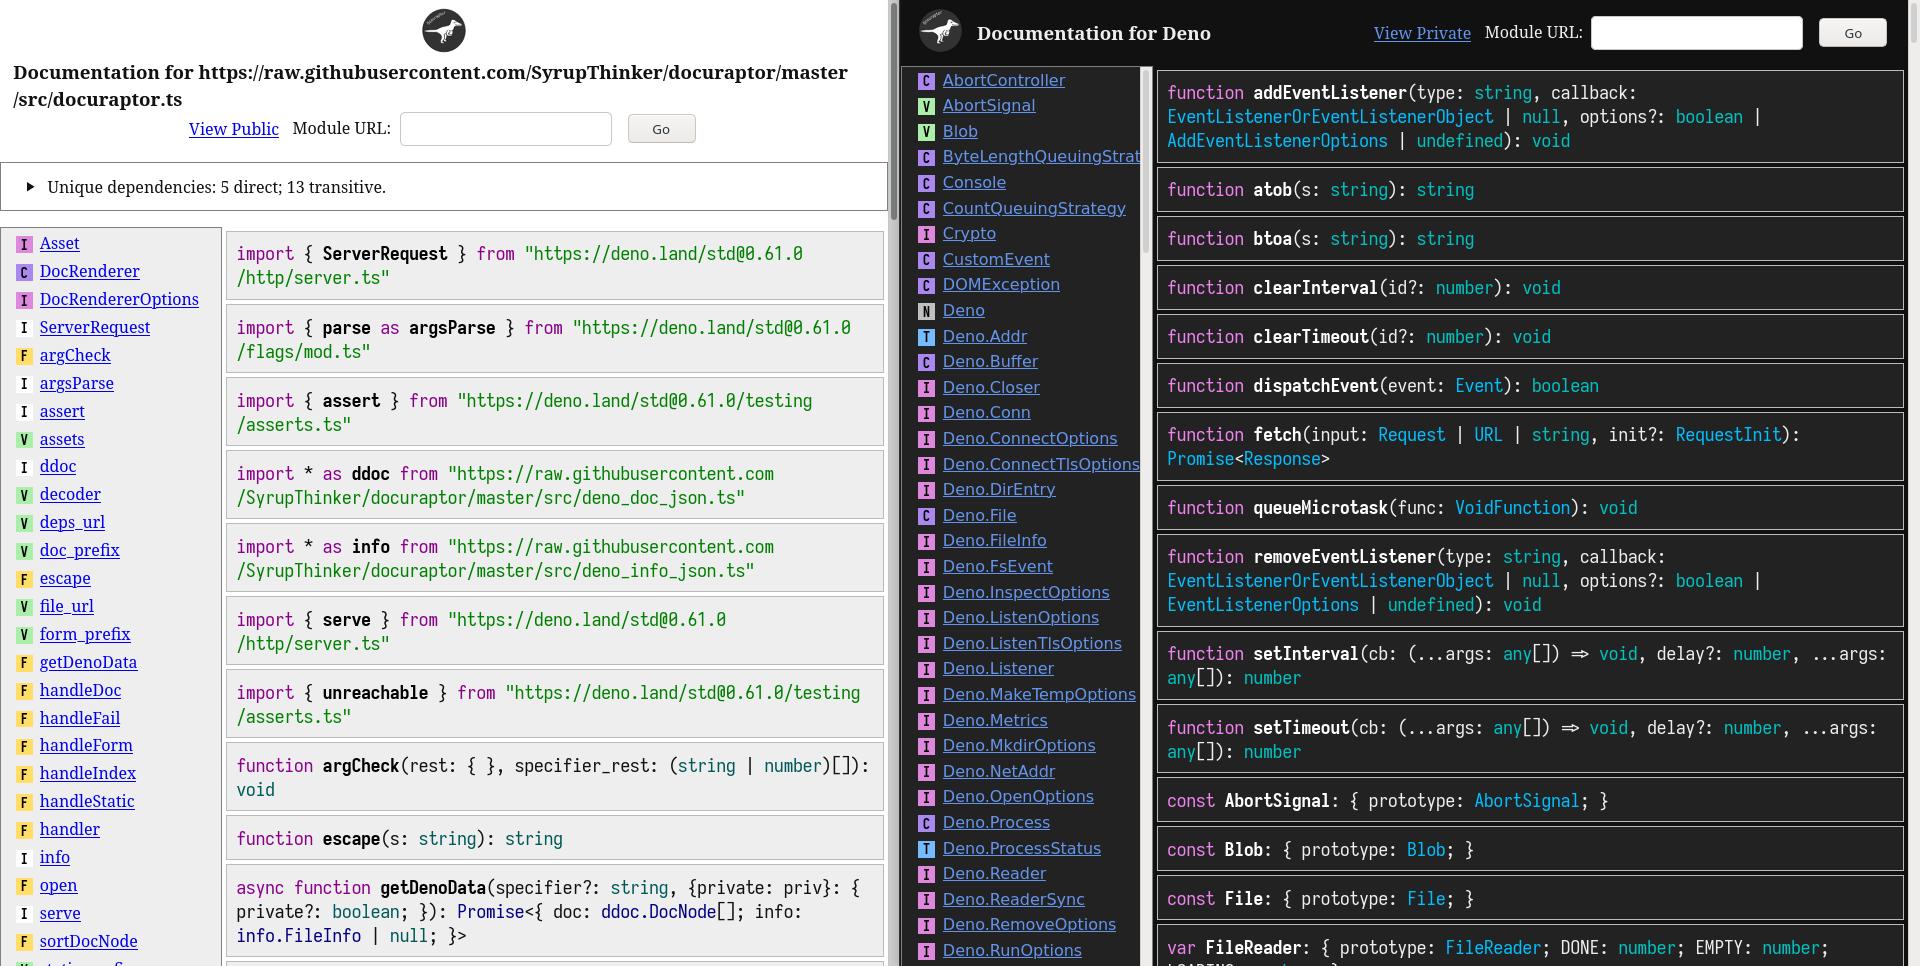 Docuraptor documentation screenshot